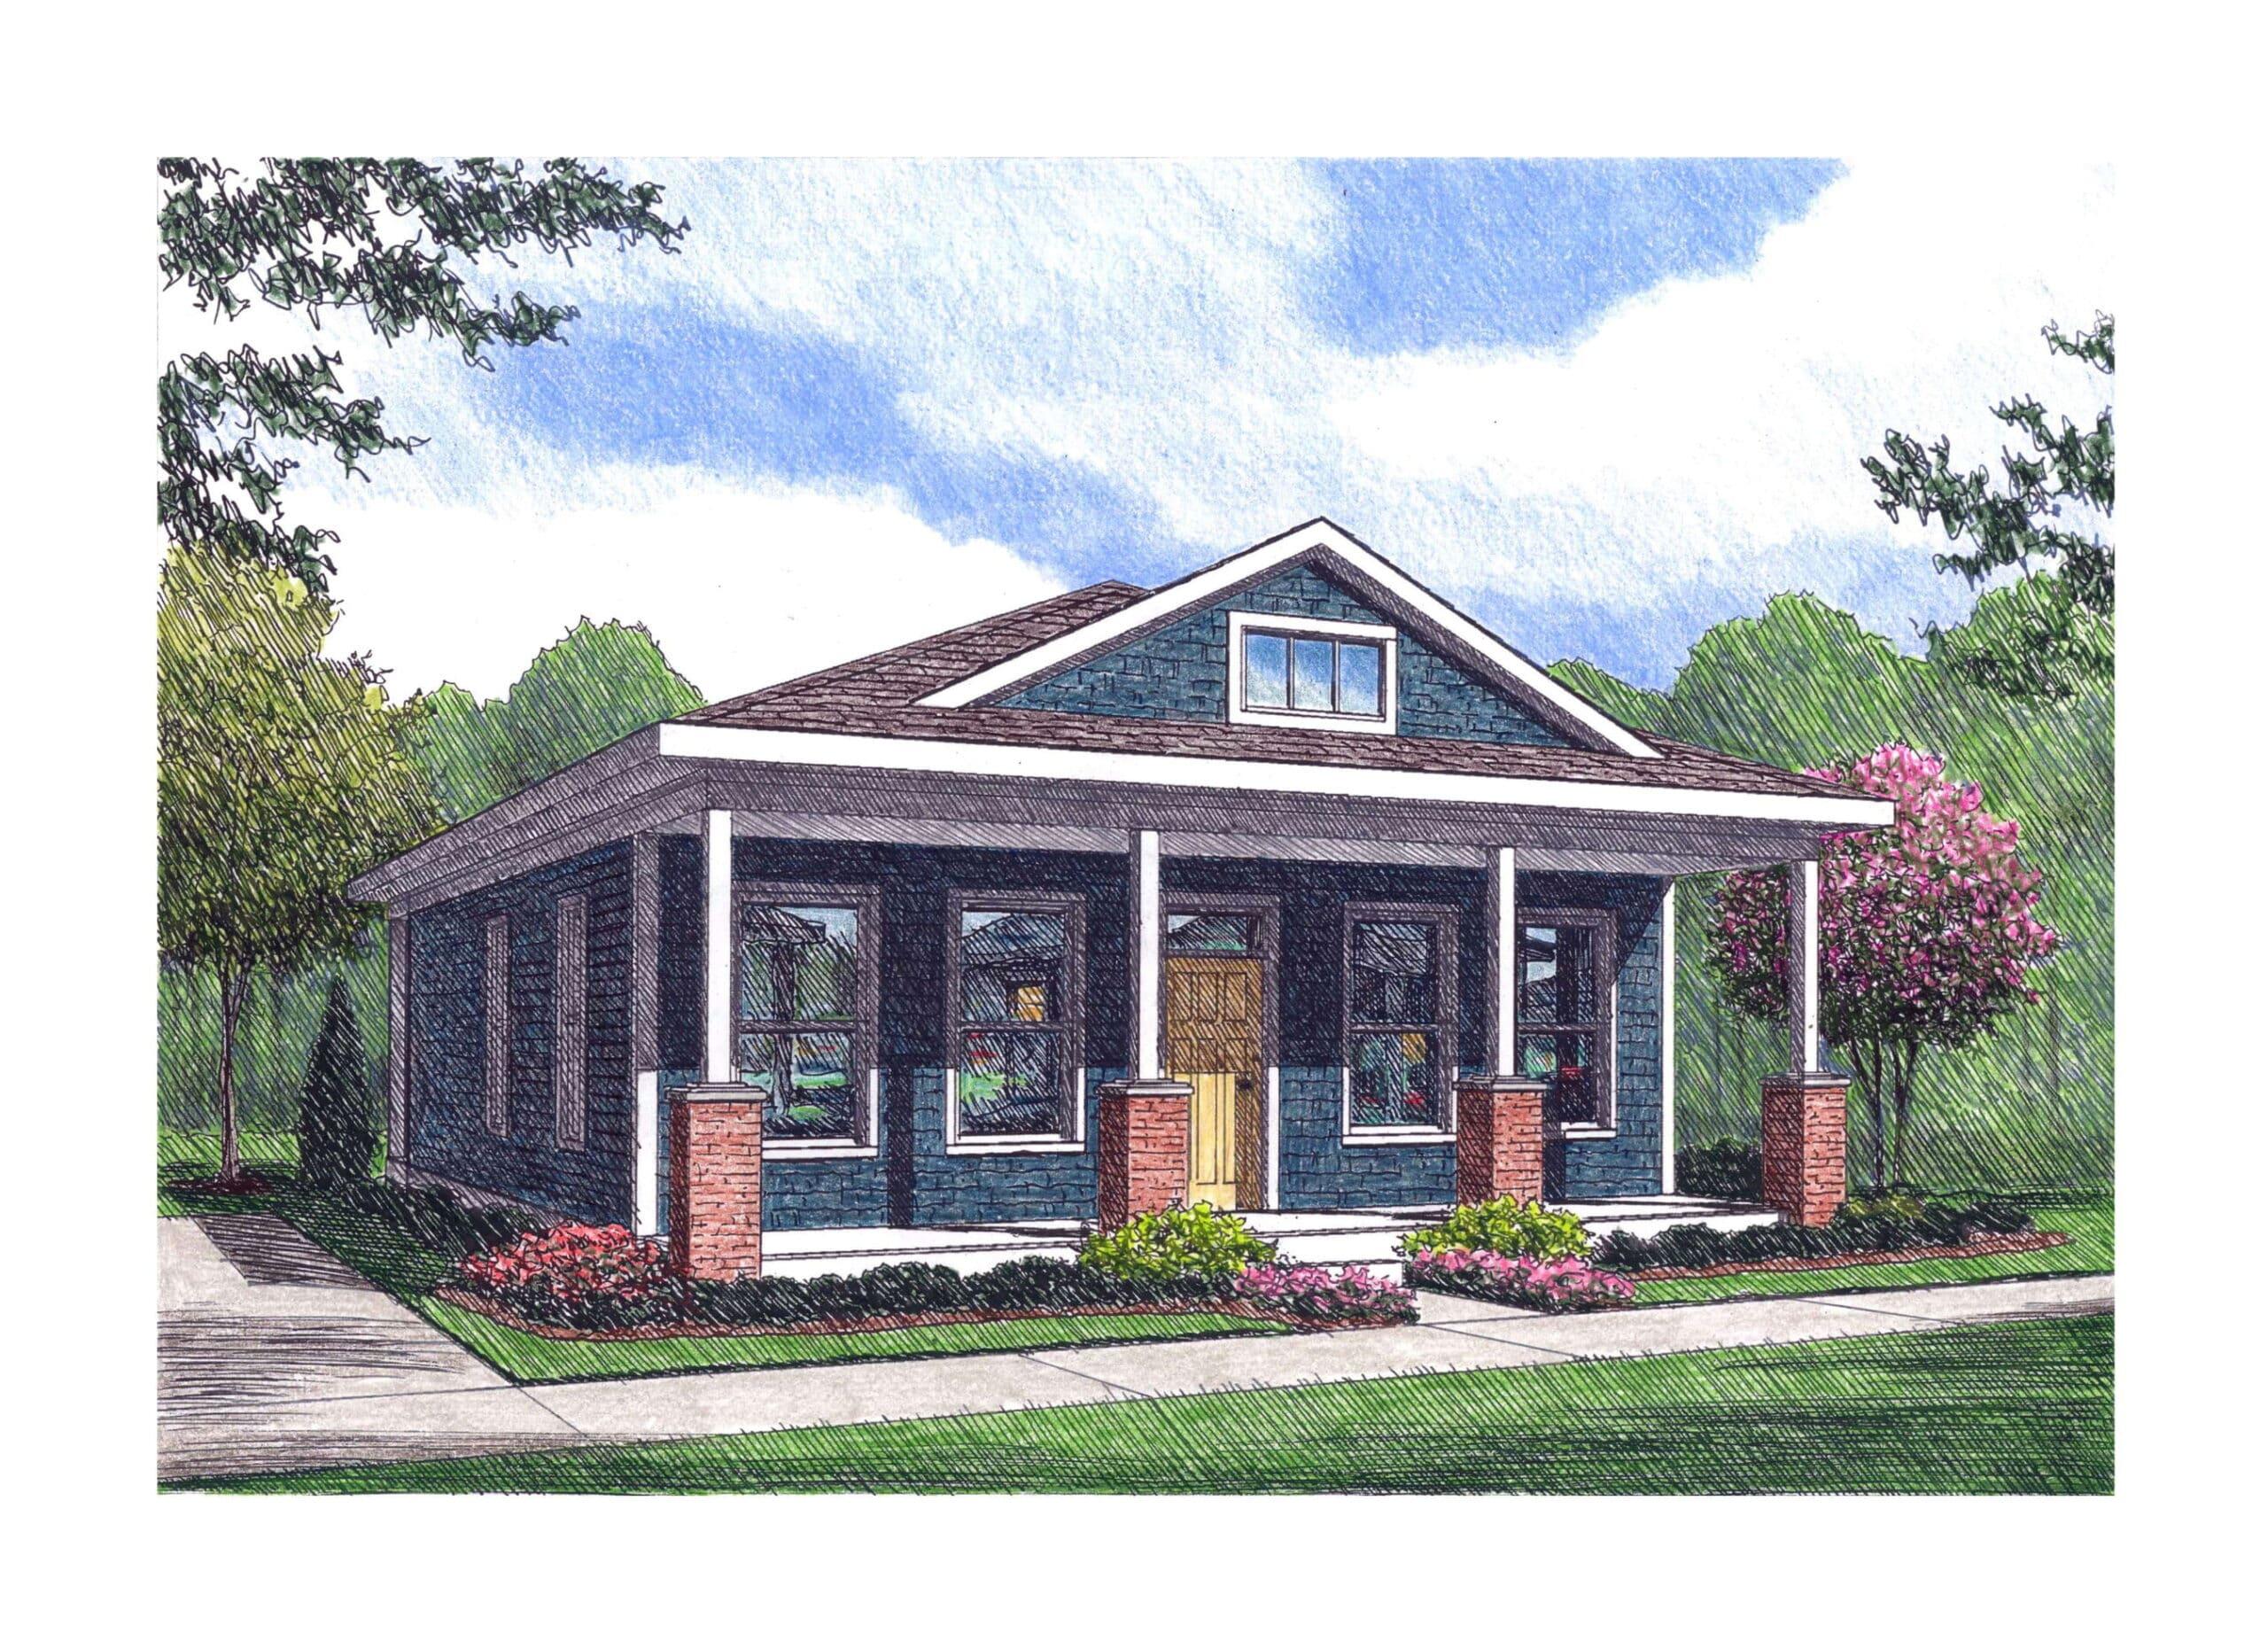 Single family rental cottage